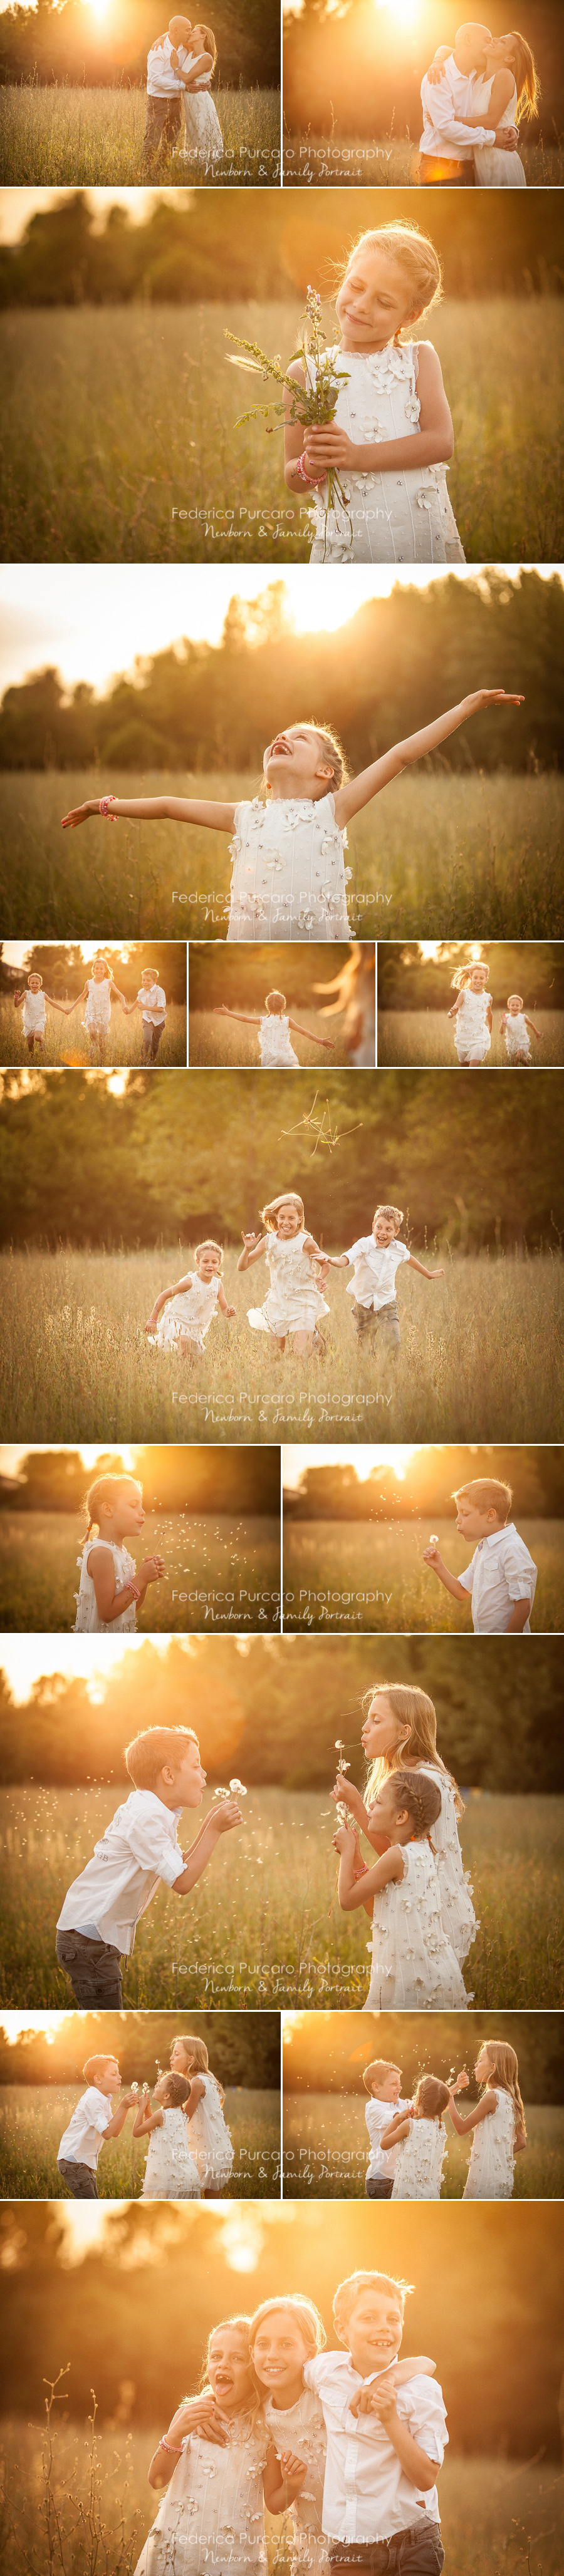 federica purcaro - fotografo bambini modena 2